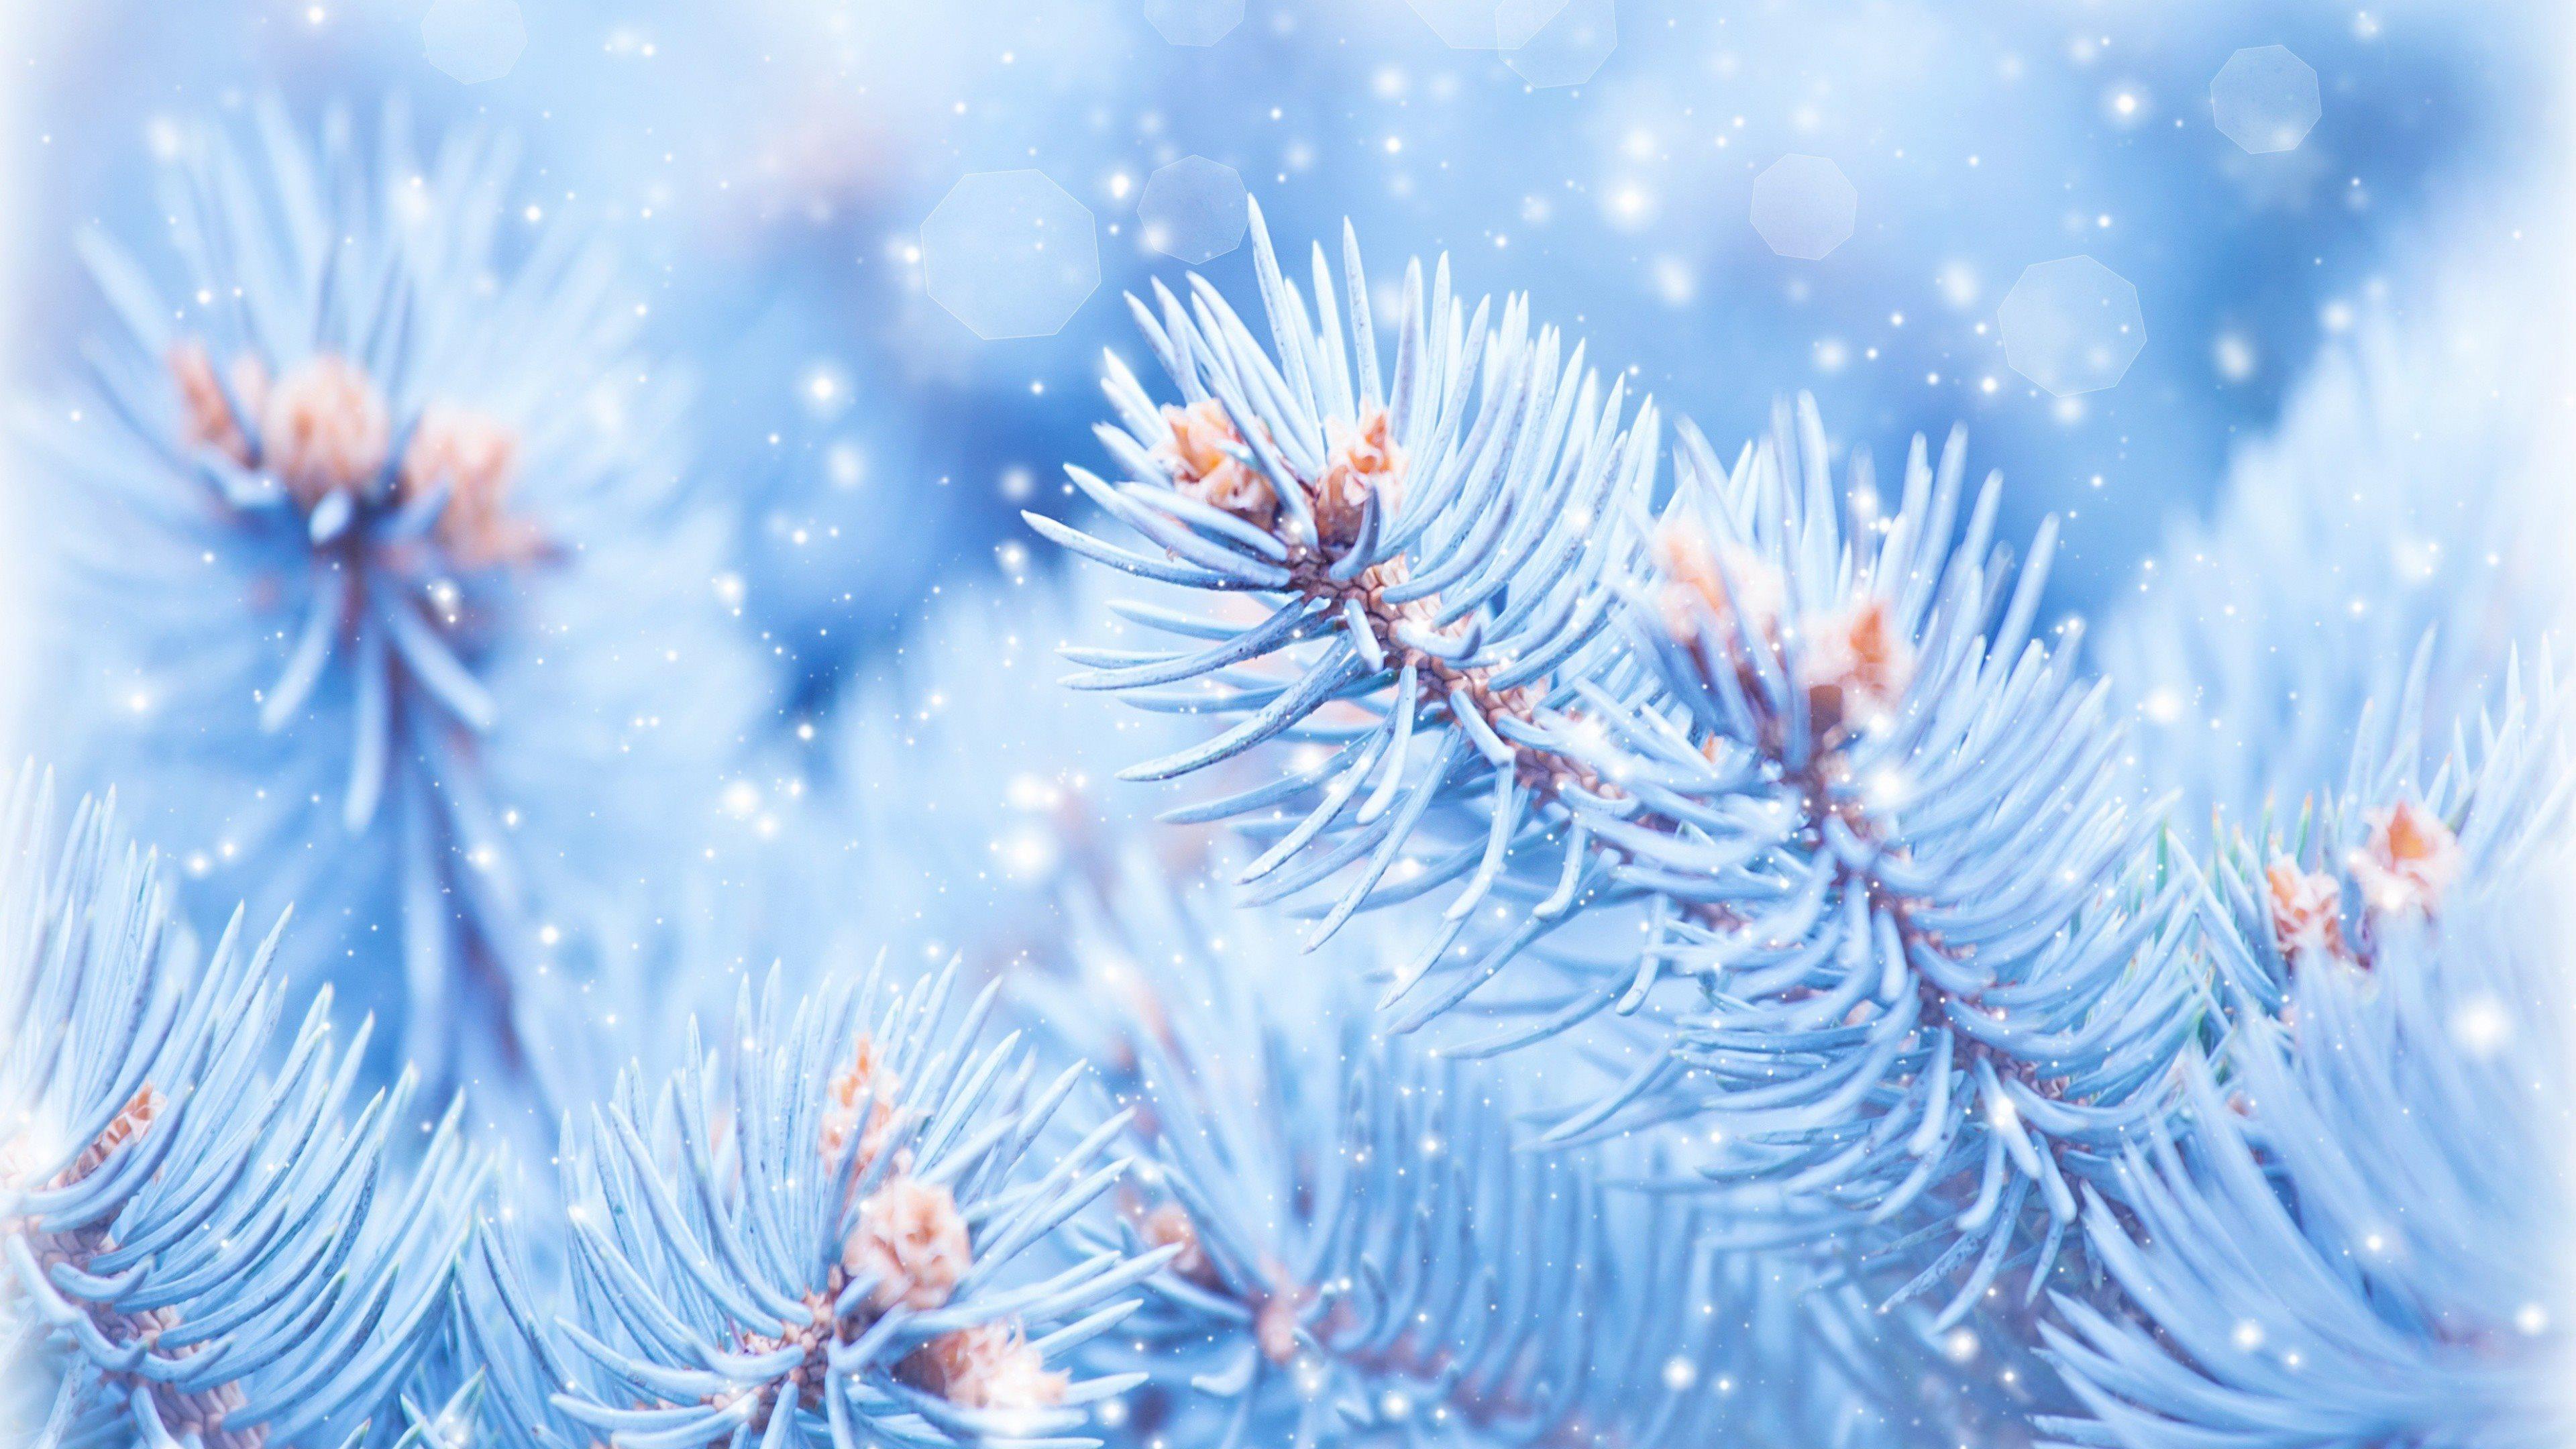 природа ветка снег  № 3089959 бесплатно